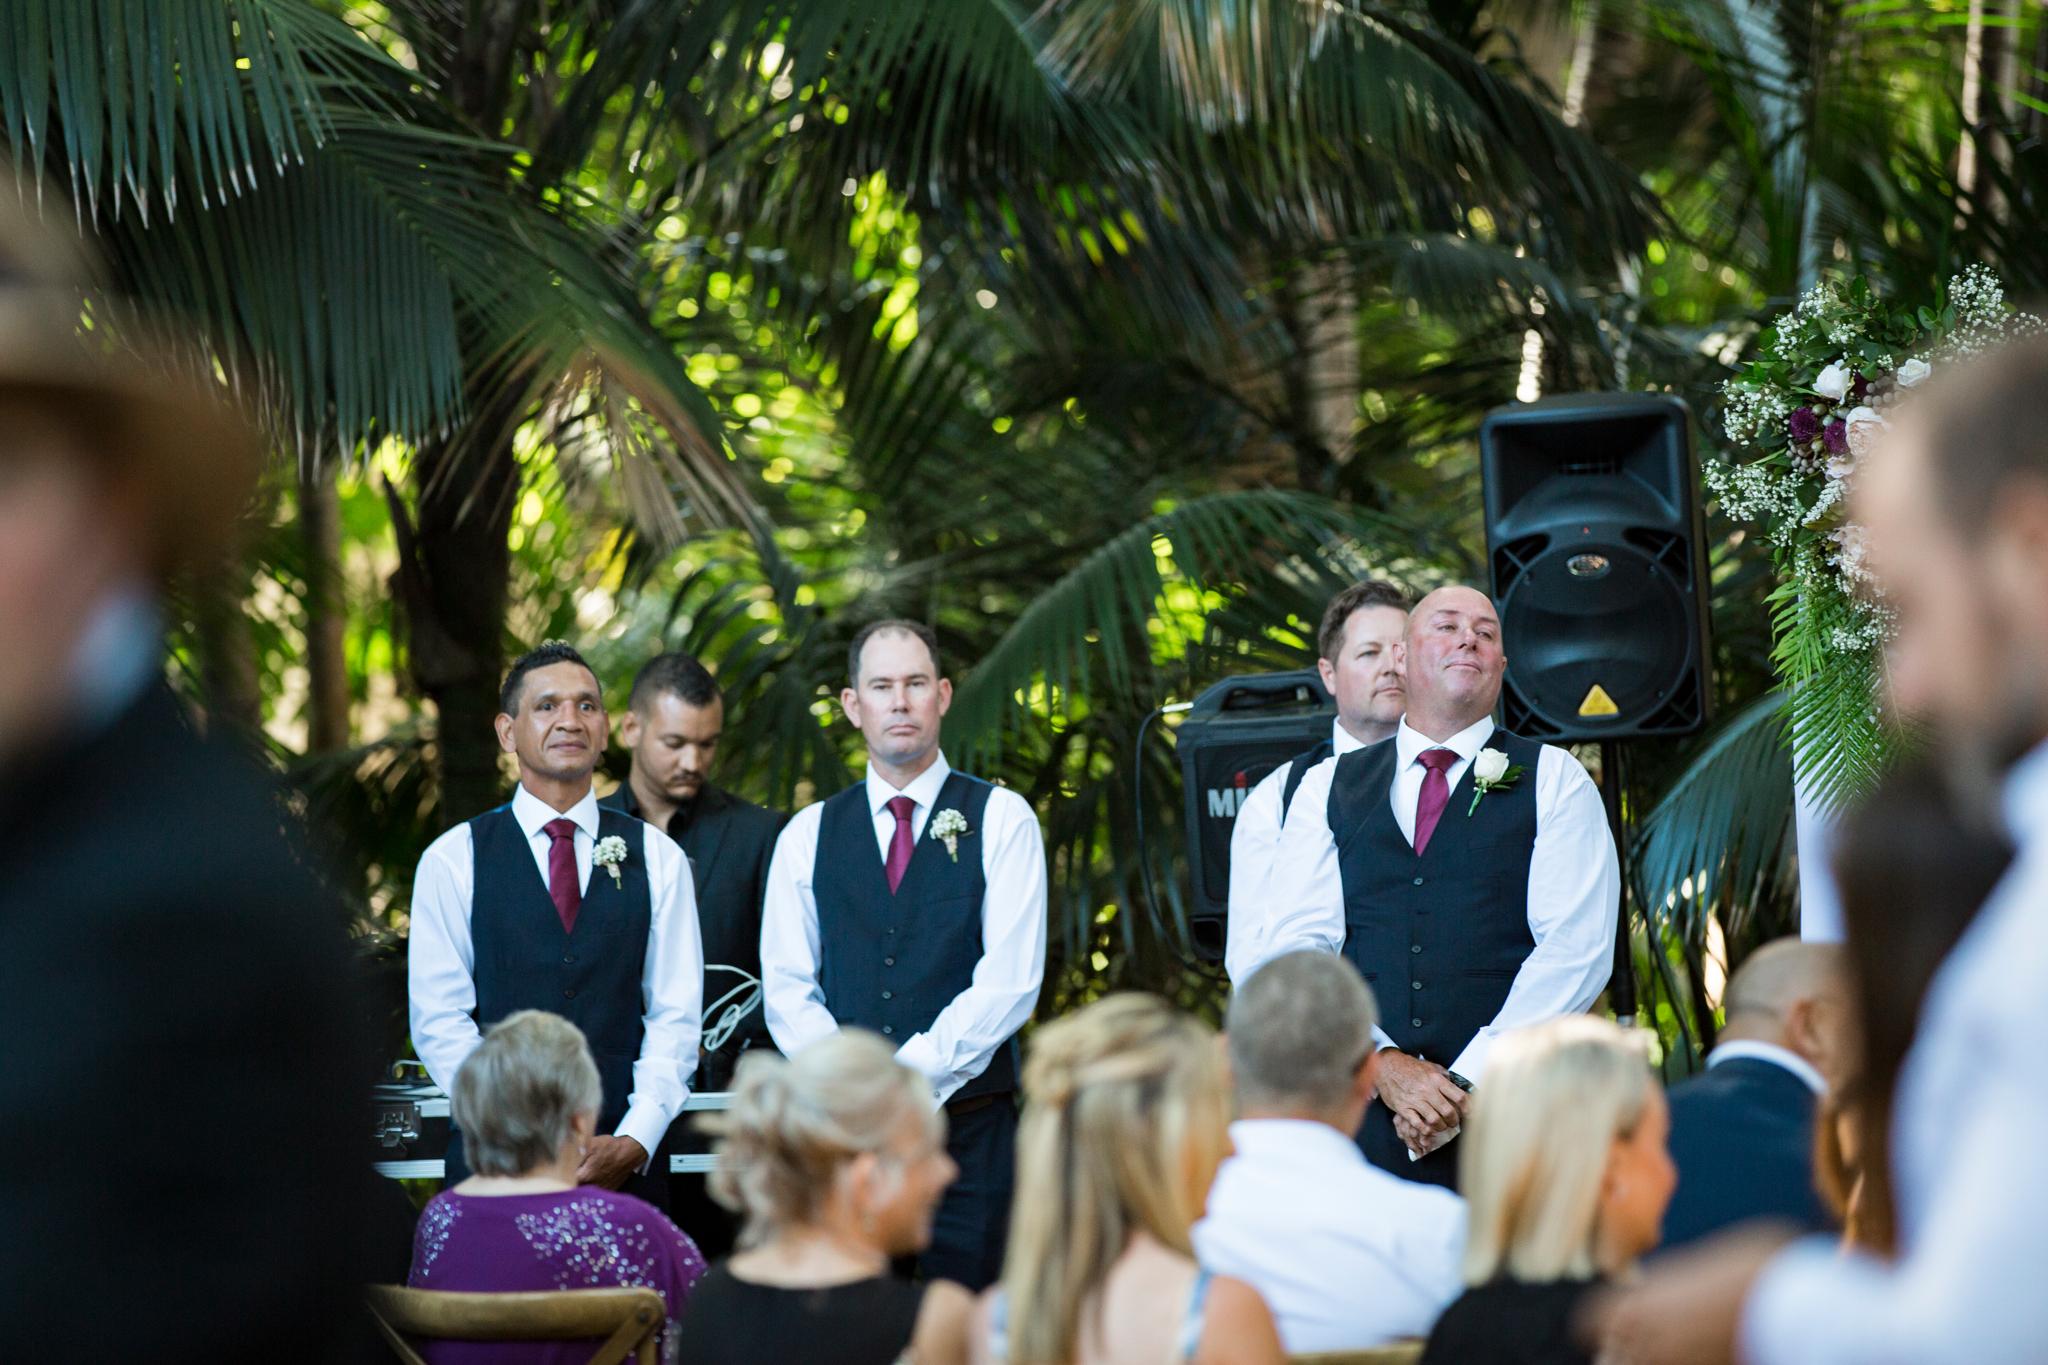 Kyme-steve-wedding-22.jpg